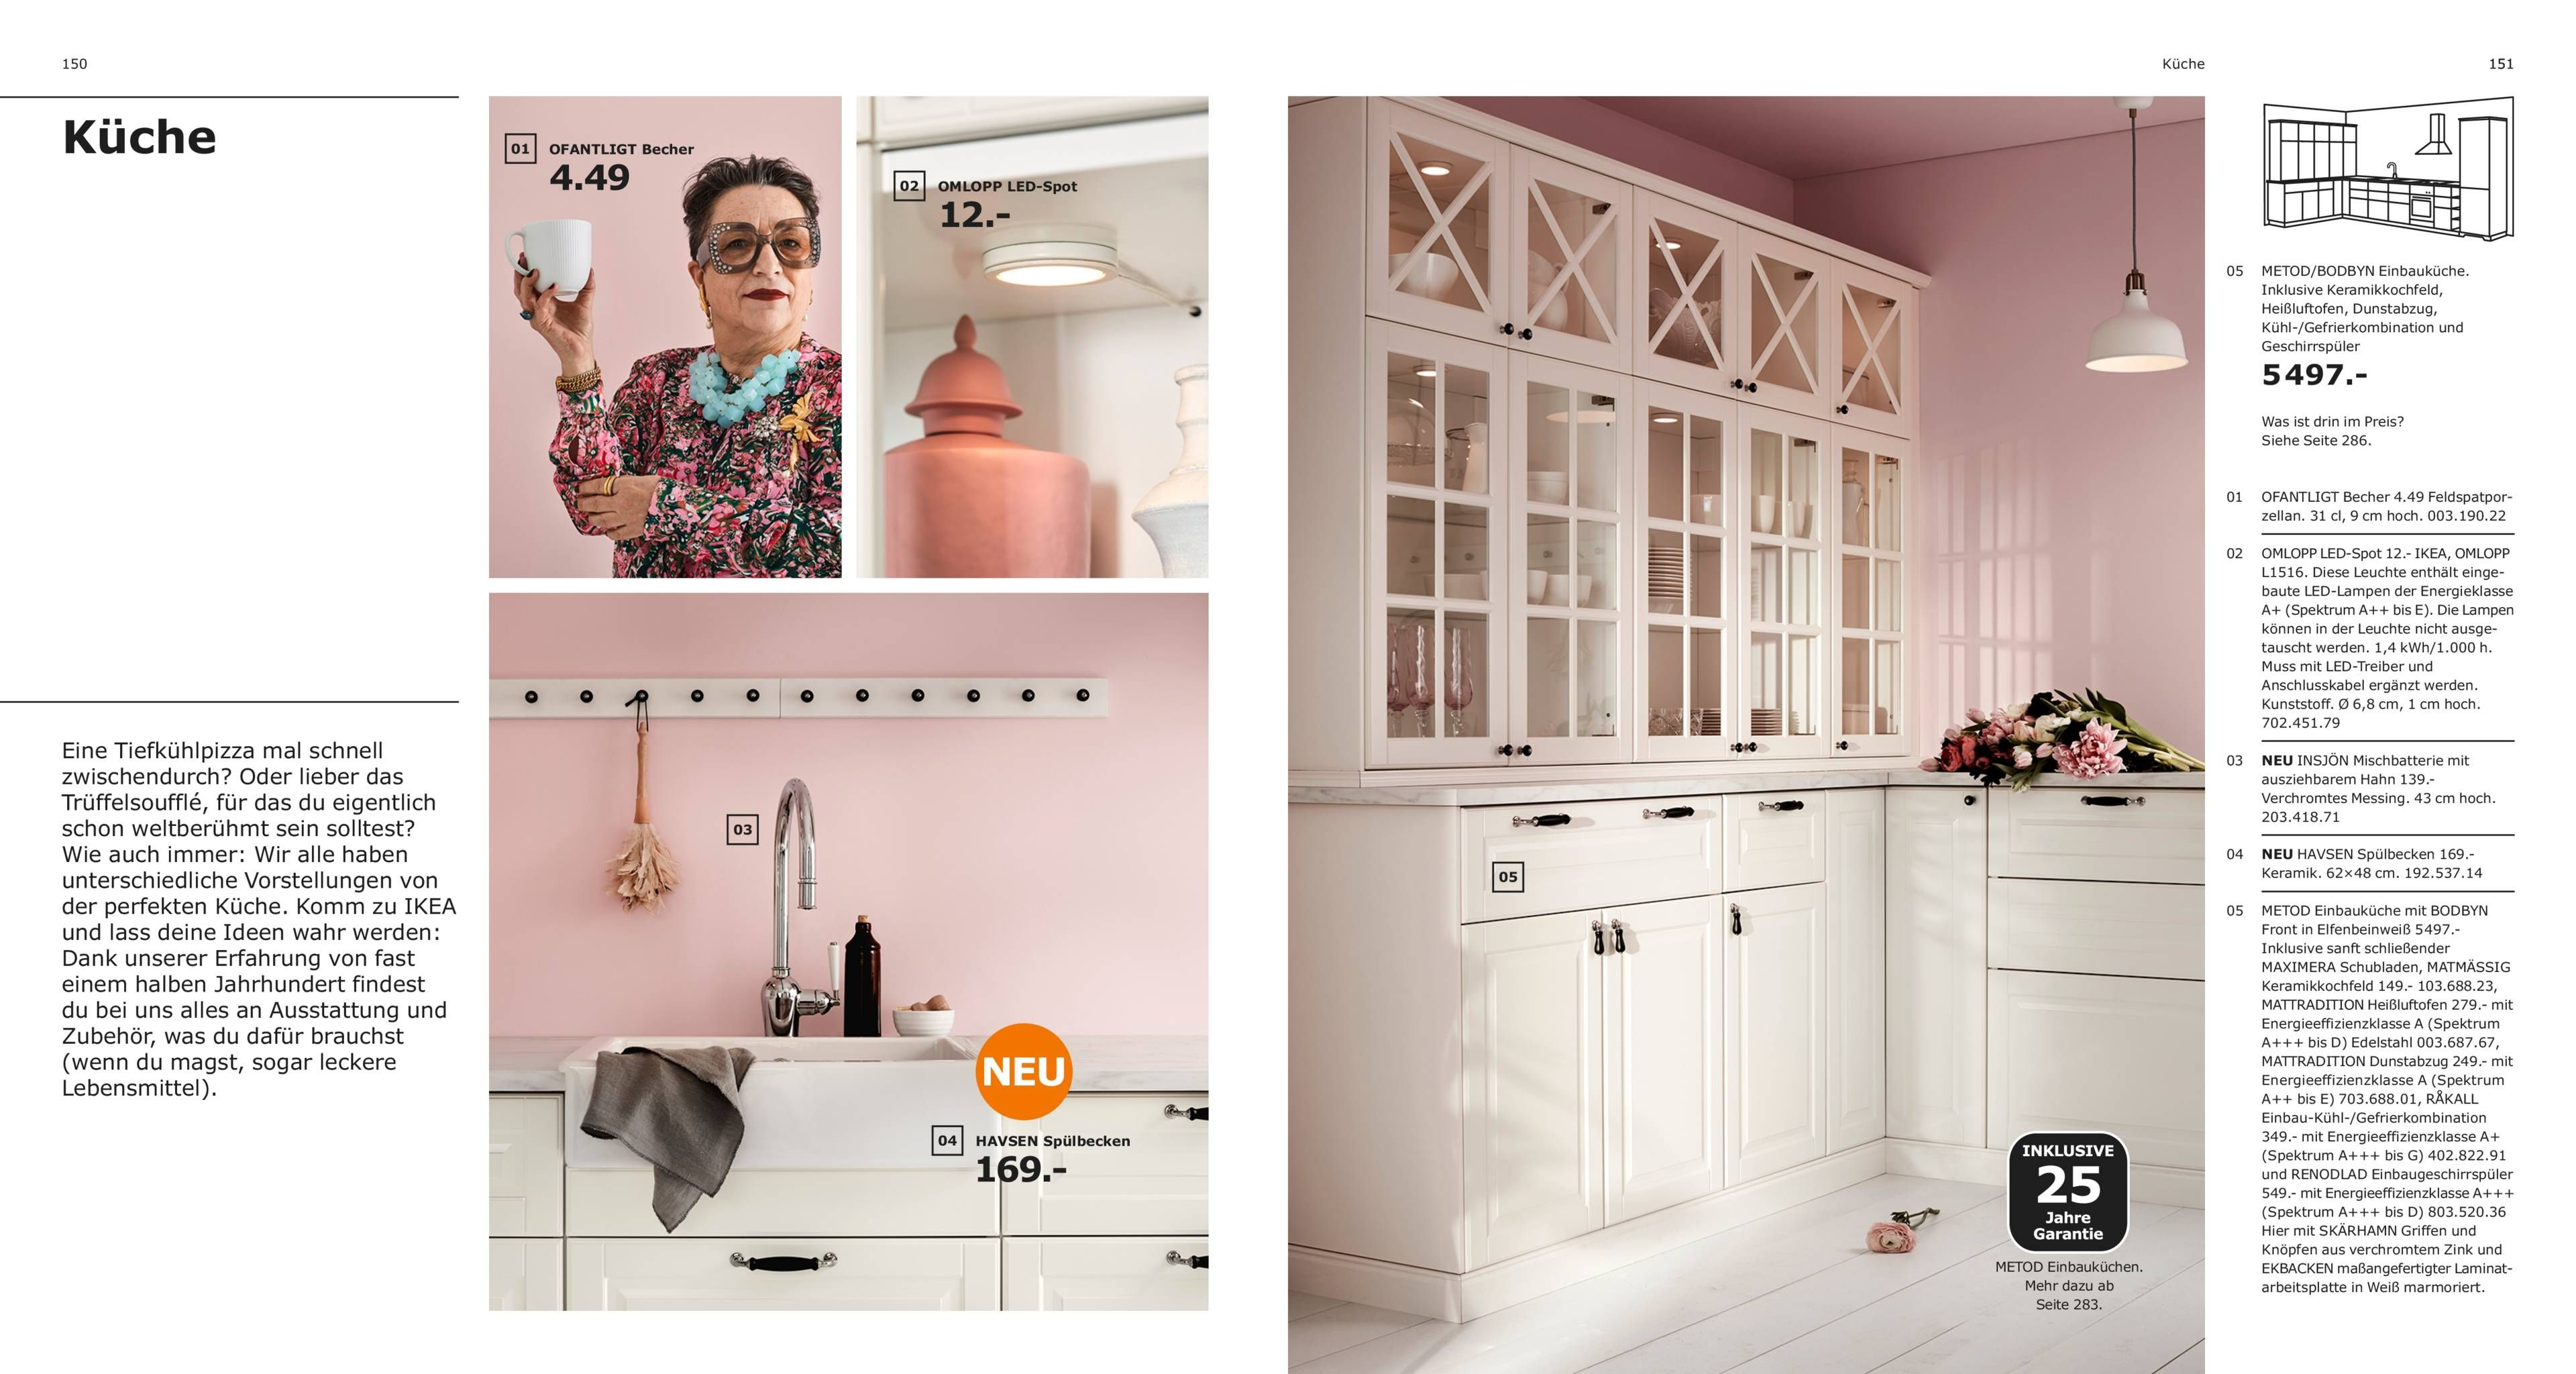 Kuche Ikea Katalog 2019 Ikea Kuche Ikea Und Katalog